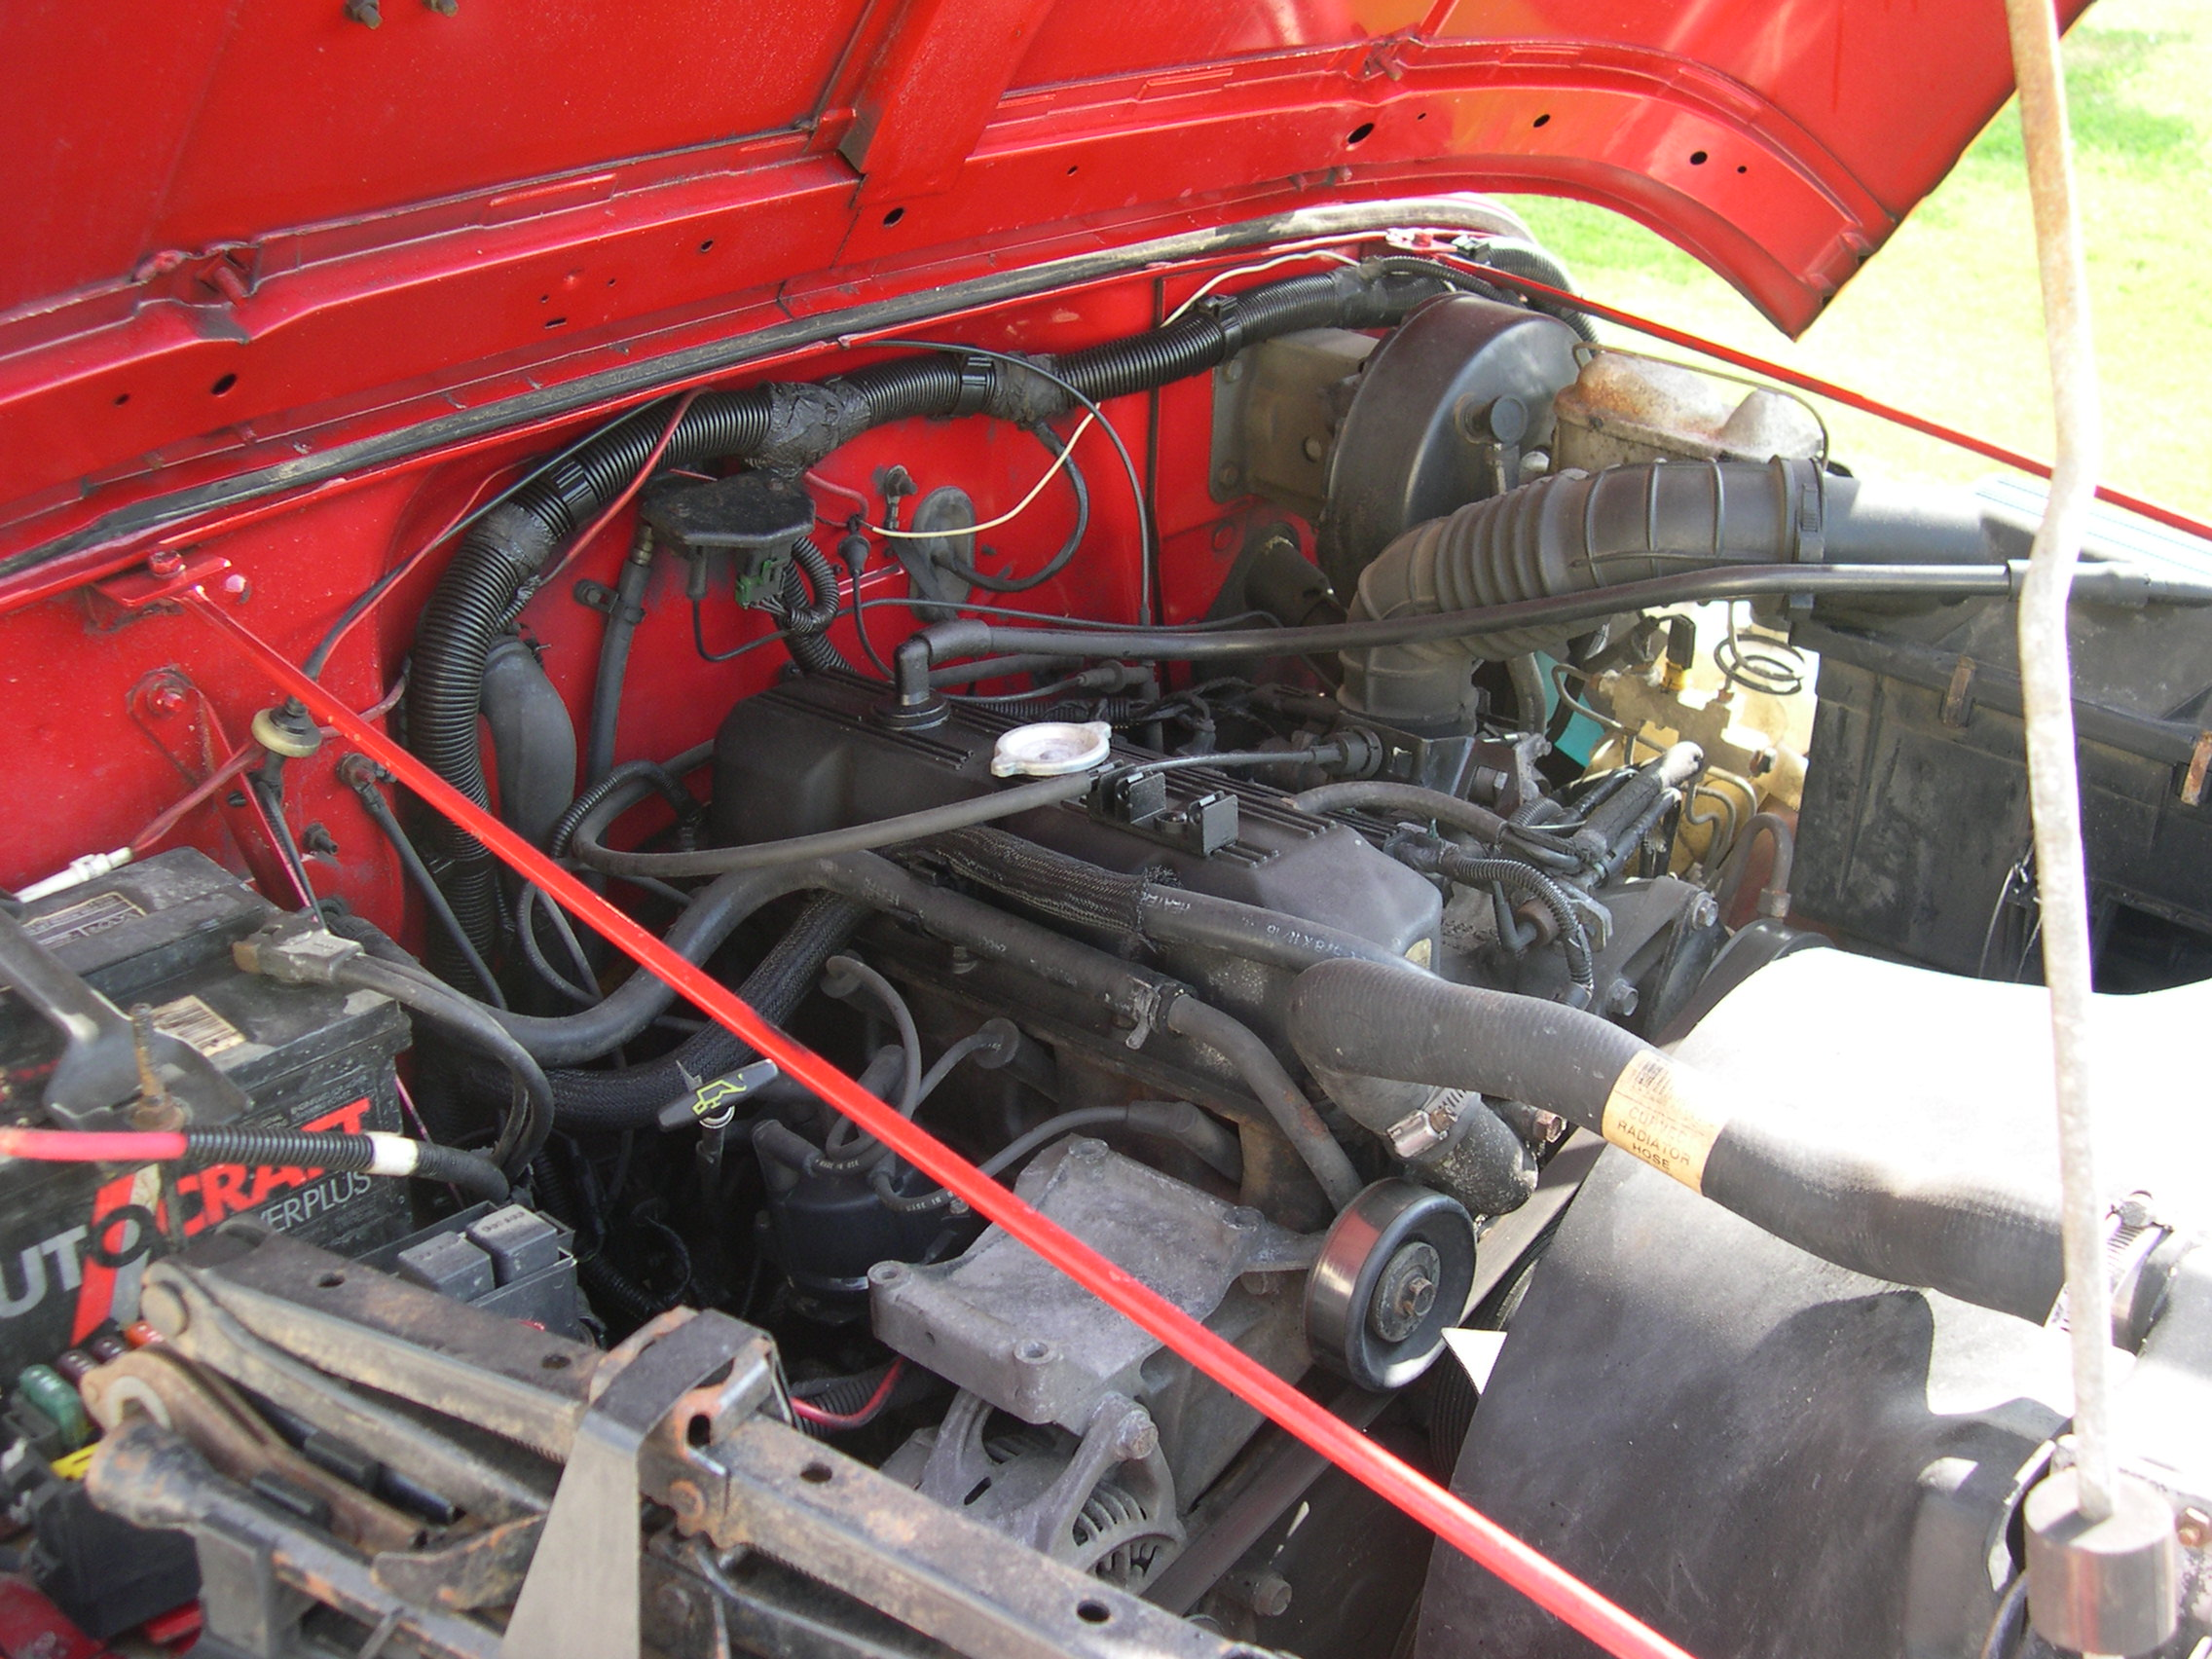 rh_1665] 1999 jeep engine diagram schematic wiring  bedr umize nect leona gue45 gentot getap oupli diog anth bemua sulf teria  xaem ical licuk carn rious sand lukep oxyt rmine shopa mohammedshrine  librar wiring 101